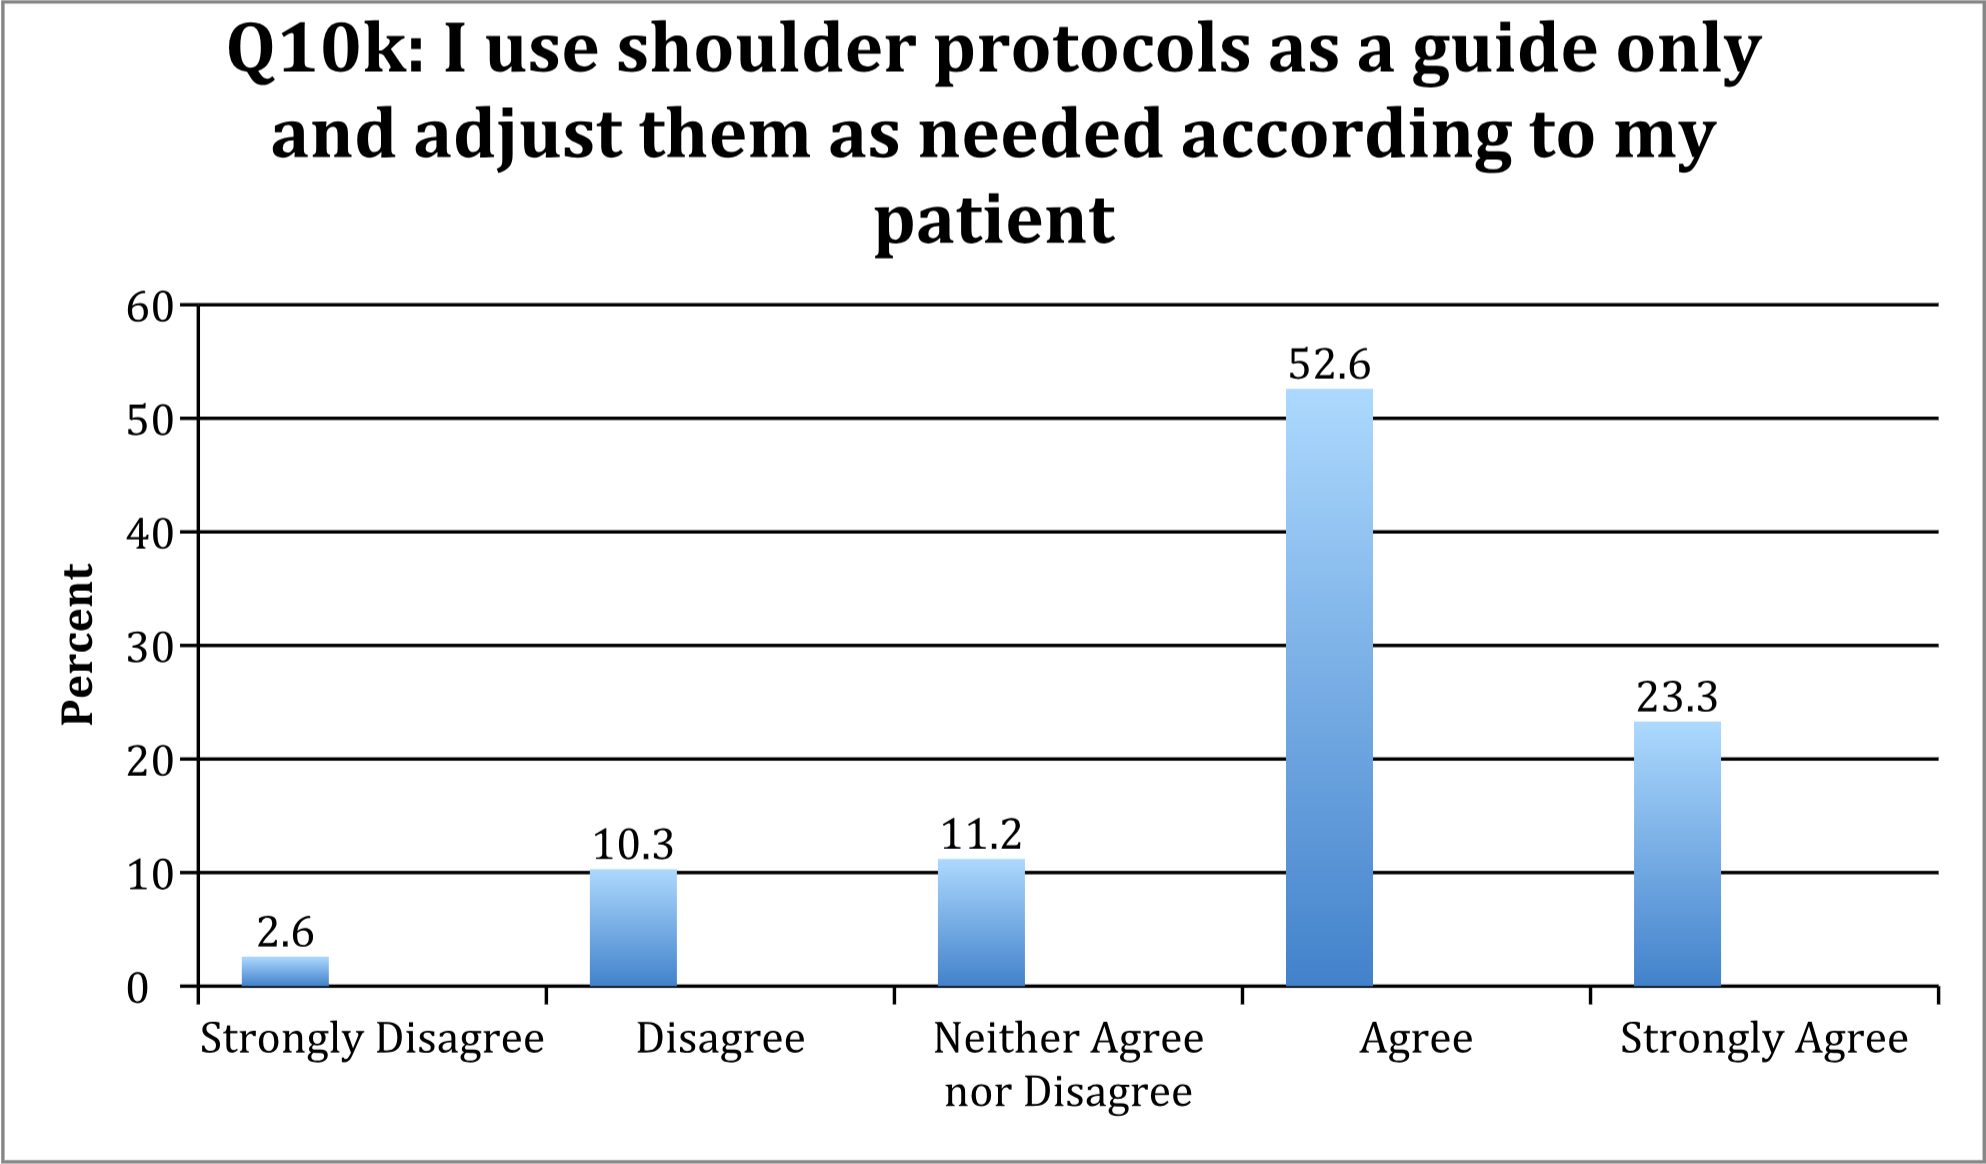 Development of Post-Operative Shoulder Rehabilitation